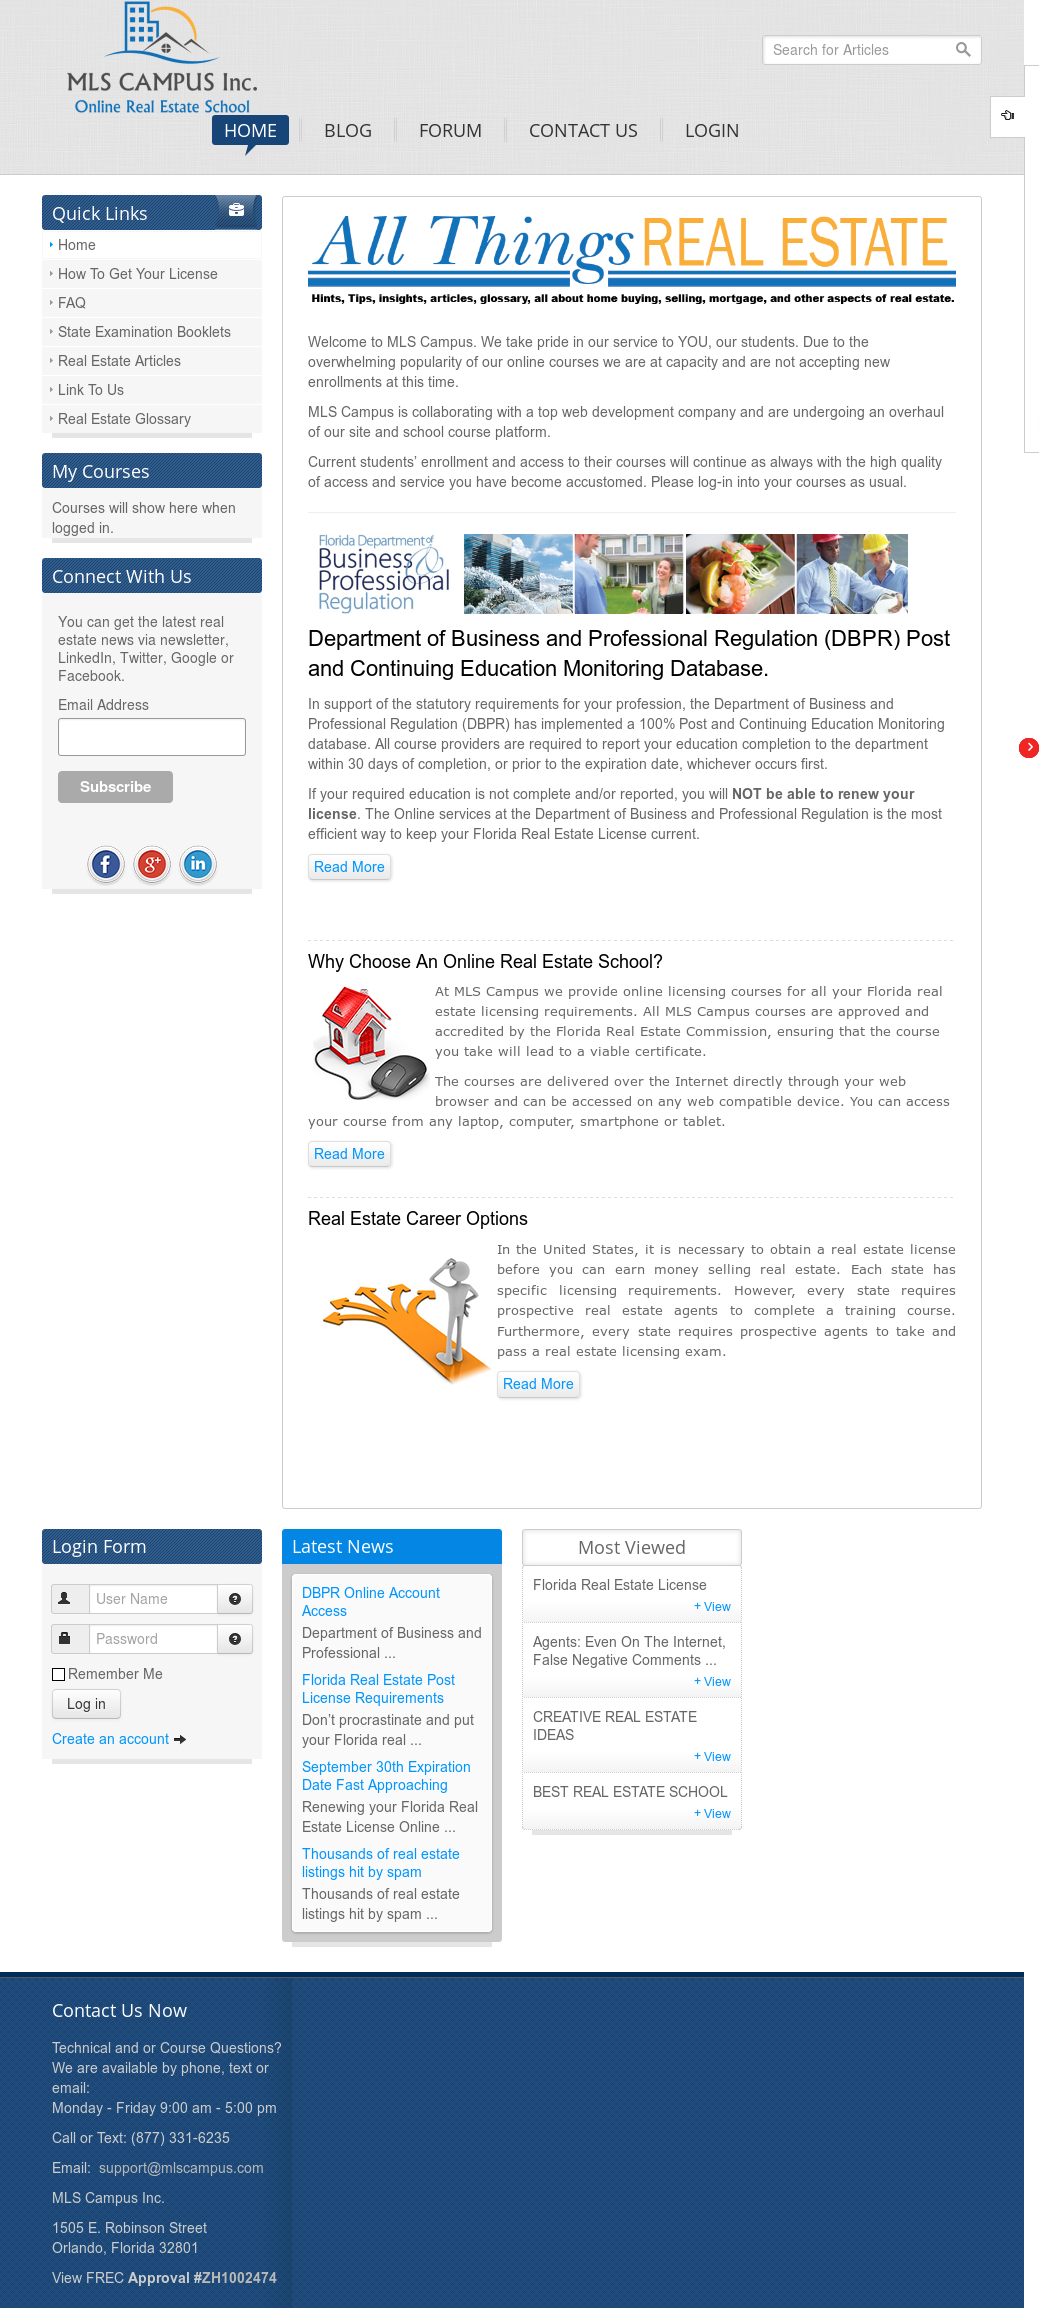 Mls Campus Real Estate School Competitors, Revenue and